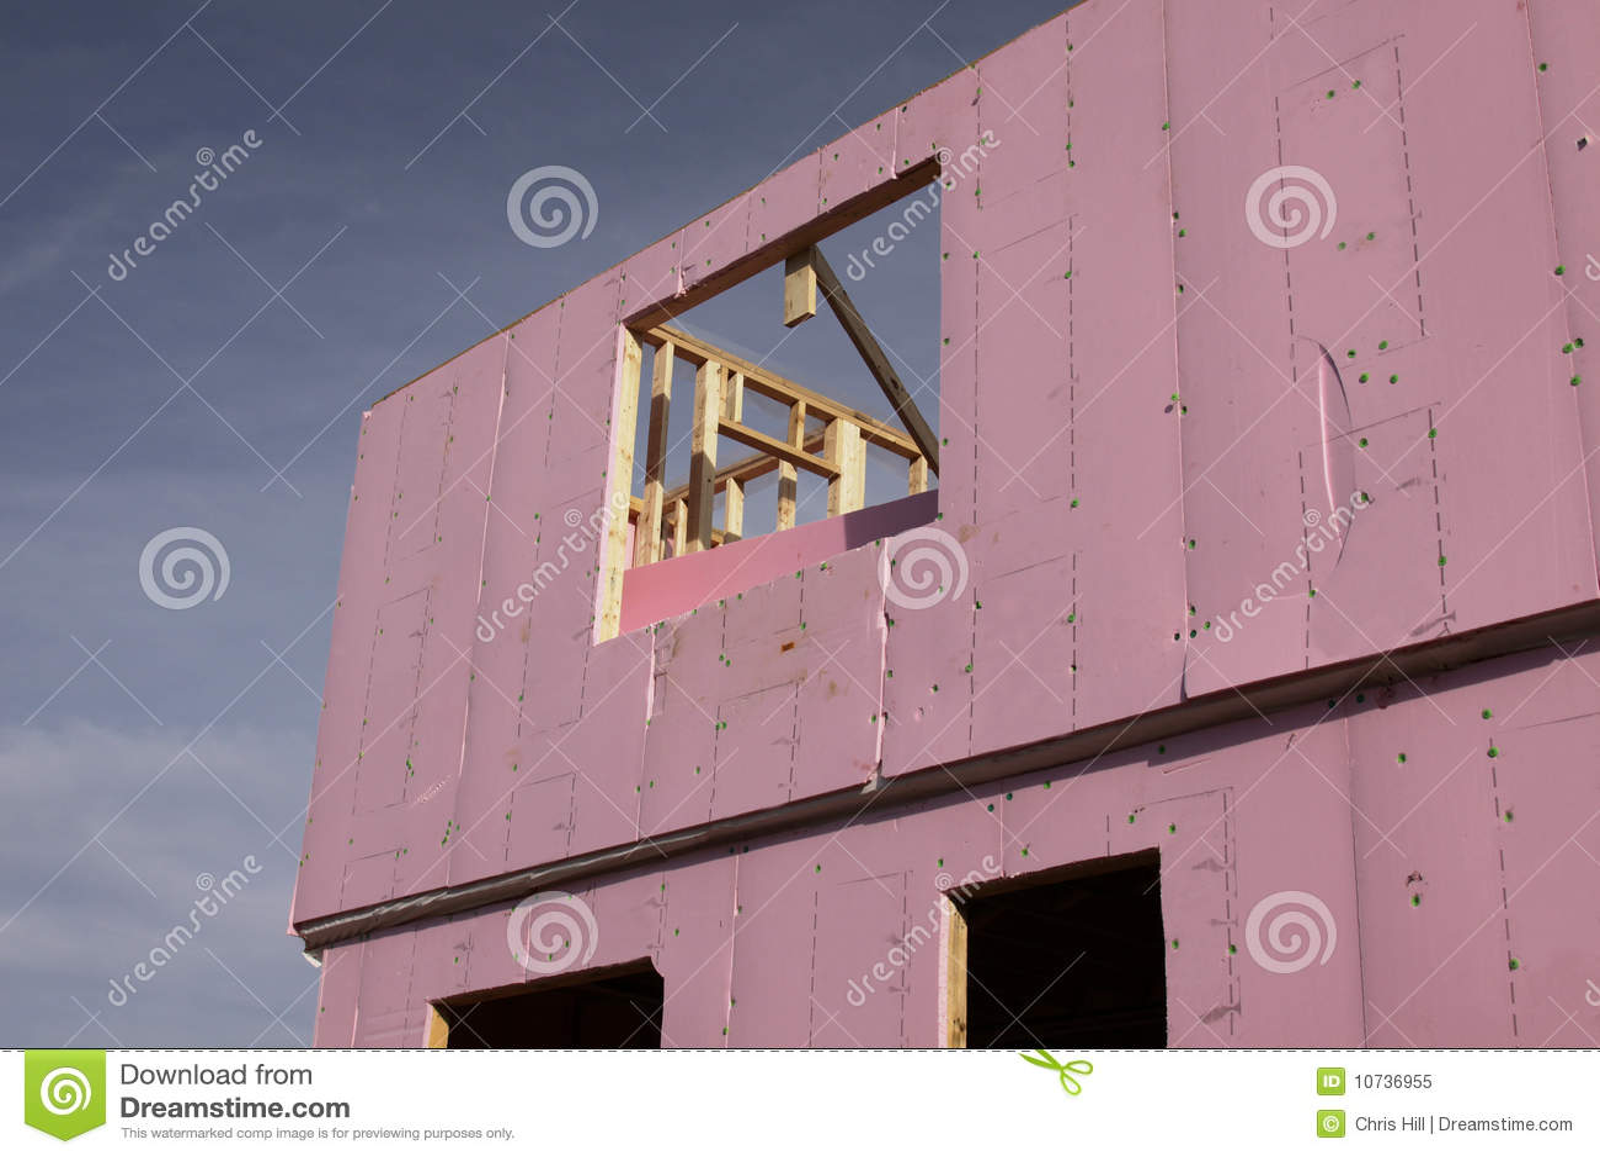 Isolation Sur Une Maison Neuve Image Stock Image Du